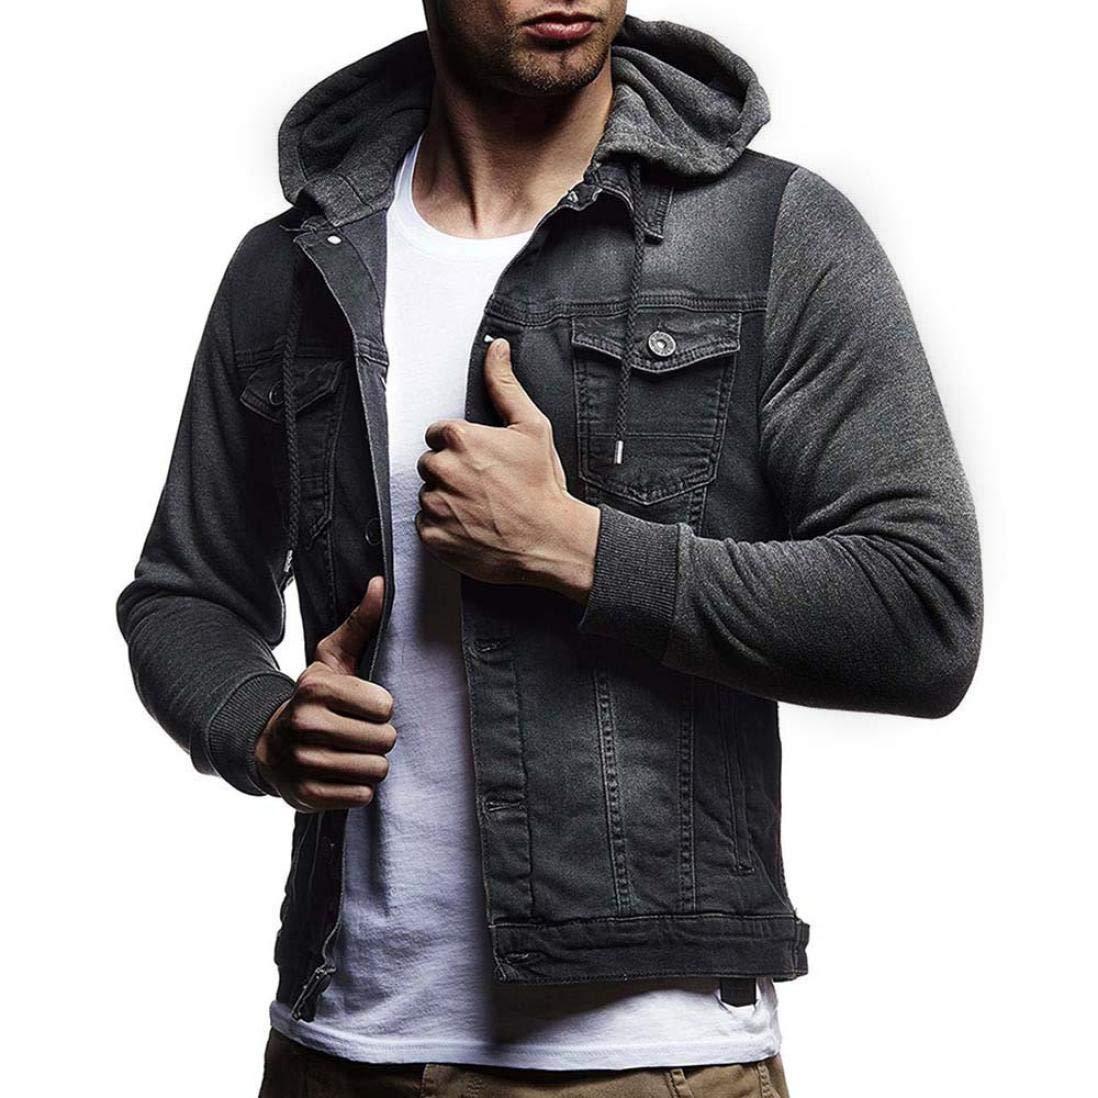 Amazon.com: AliveGOT - Chaqueta con capucha para hombre ...